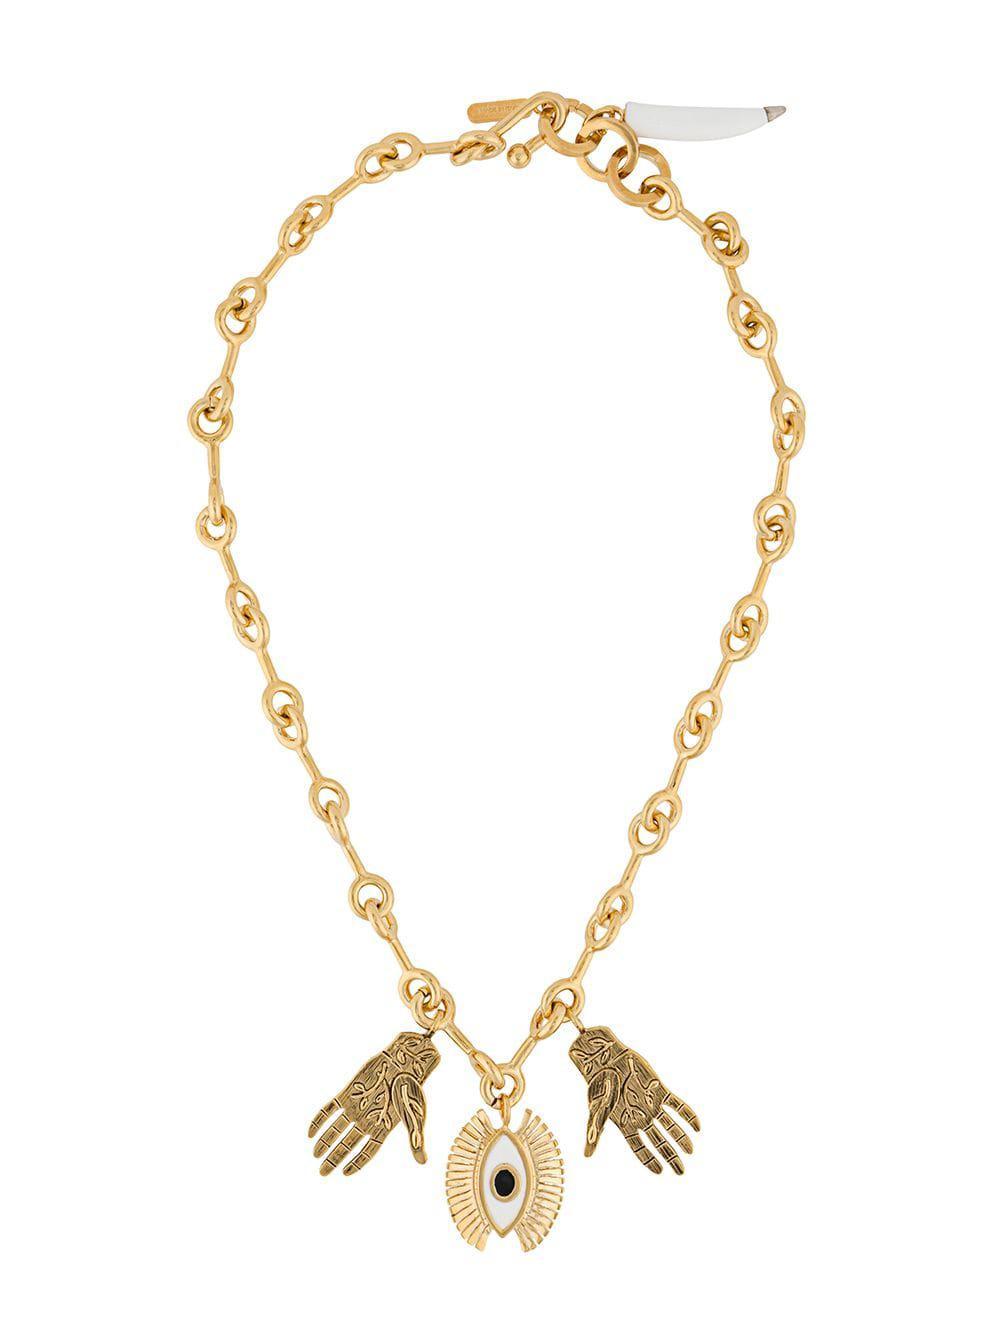 Chloé Sloan Pendant Necklace in Metallic